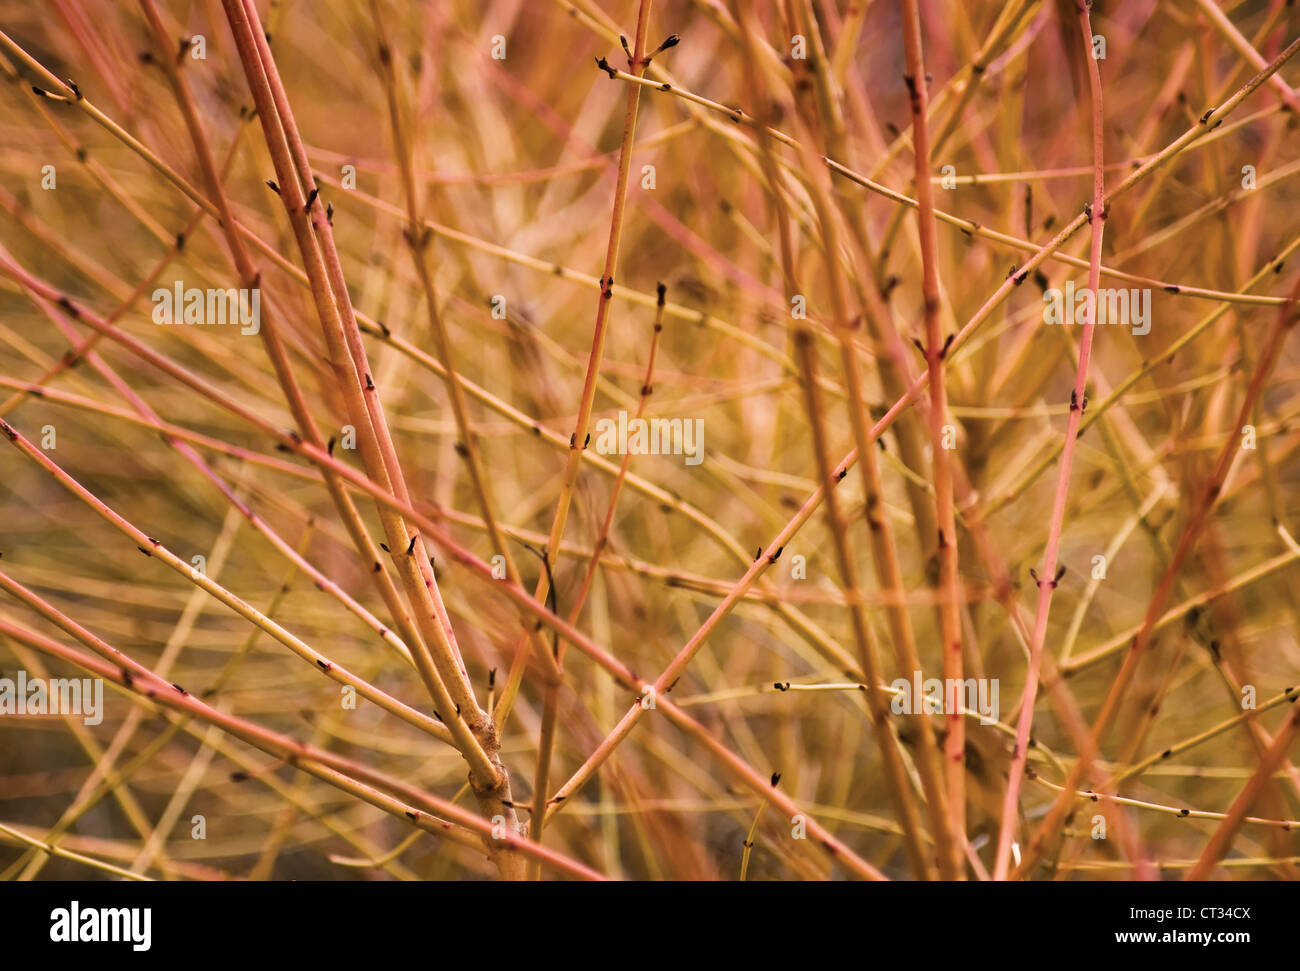 Cornus sanguinea 'Midwinter fire', Dogwood, Close up of red leafless stems on the shrub. - Stock Image